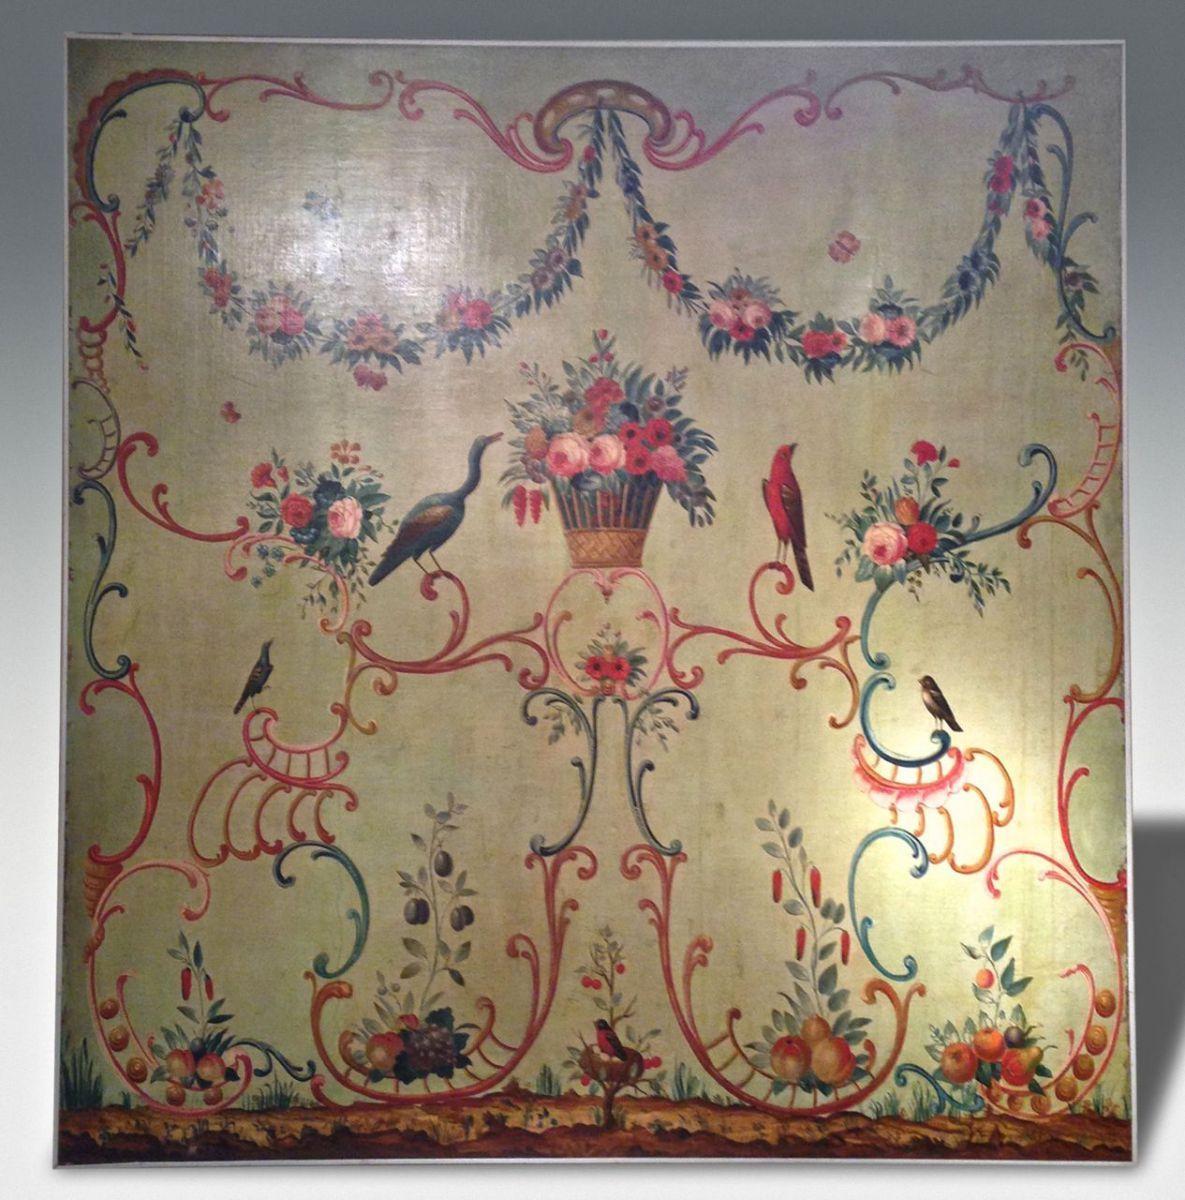 ROCOCO PAINTED PANEL. - Stock - Christopher Jones Antiques - London - Decorative Antiques